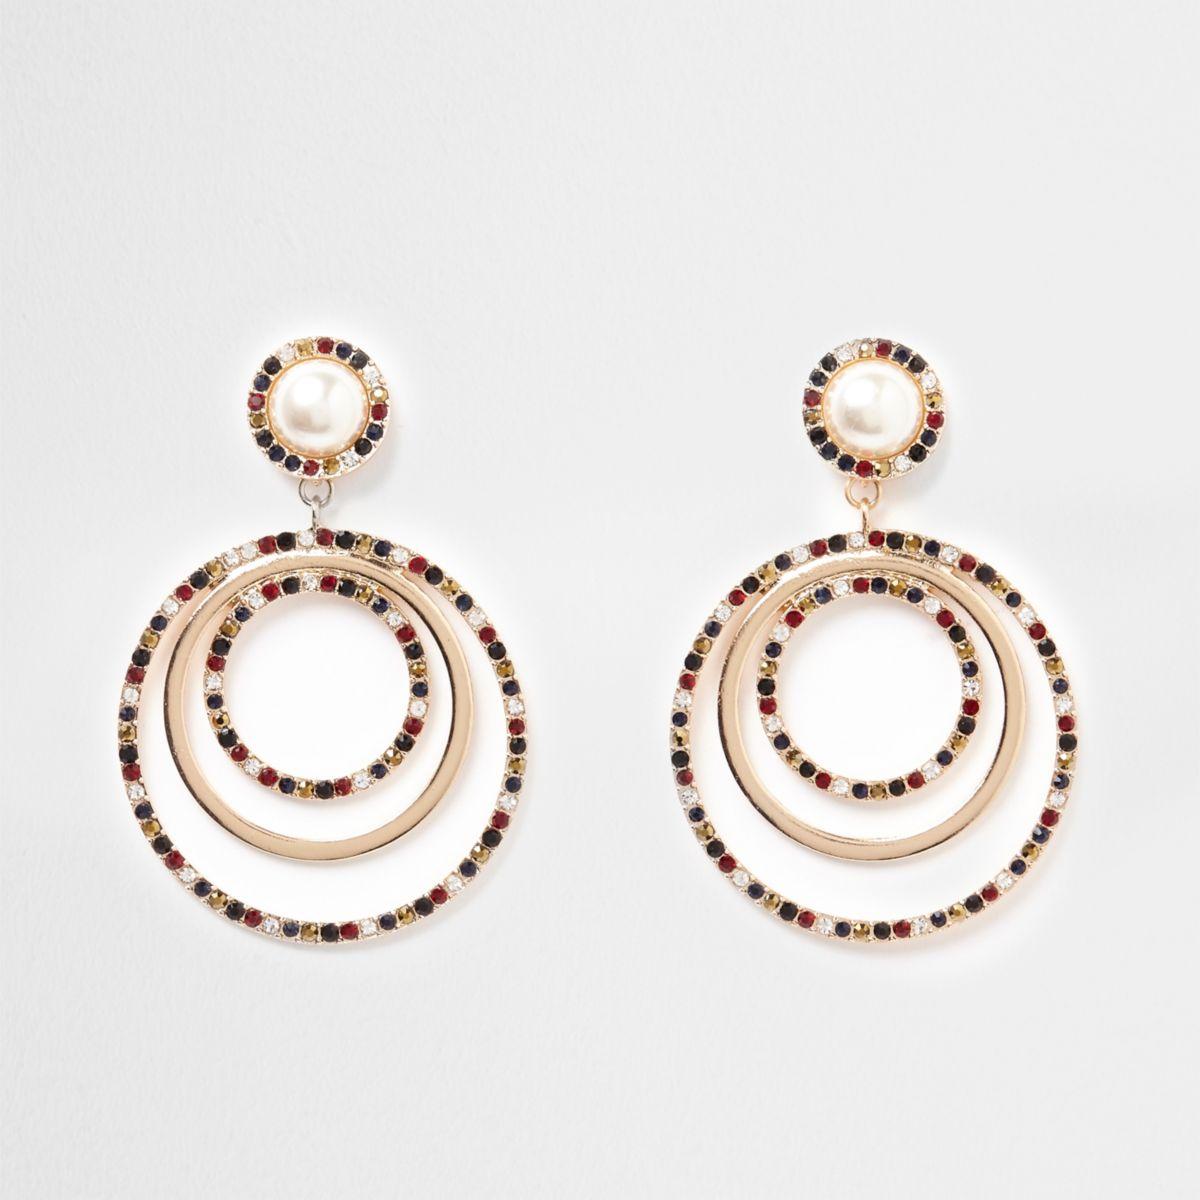 Gold tone pearl diamante ring drop earrings